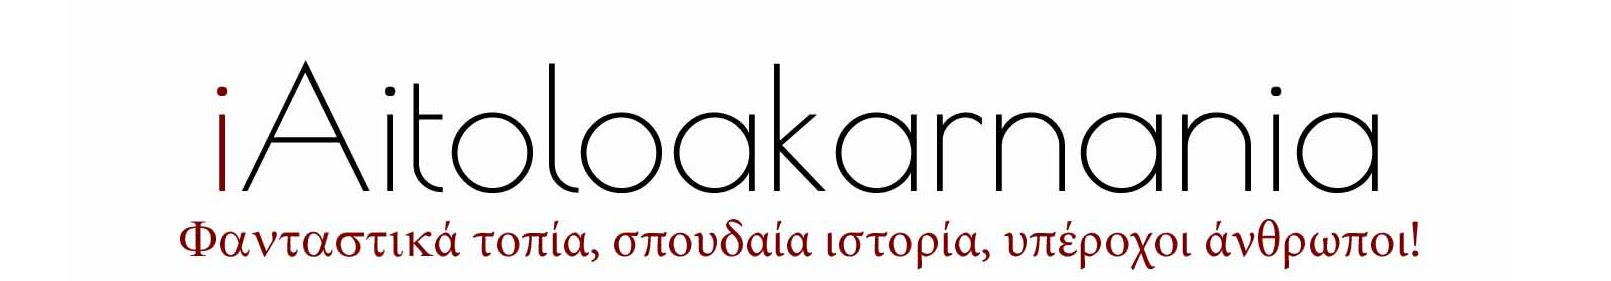 http://iaitoloakarnania.gr/2016/06/otan-epezan-tenis-sto-mesolongi-1931/